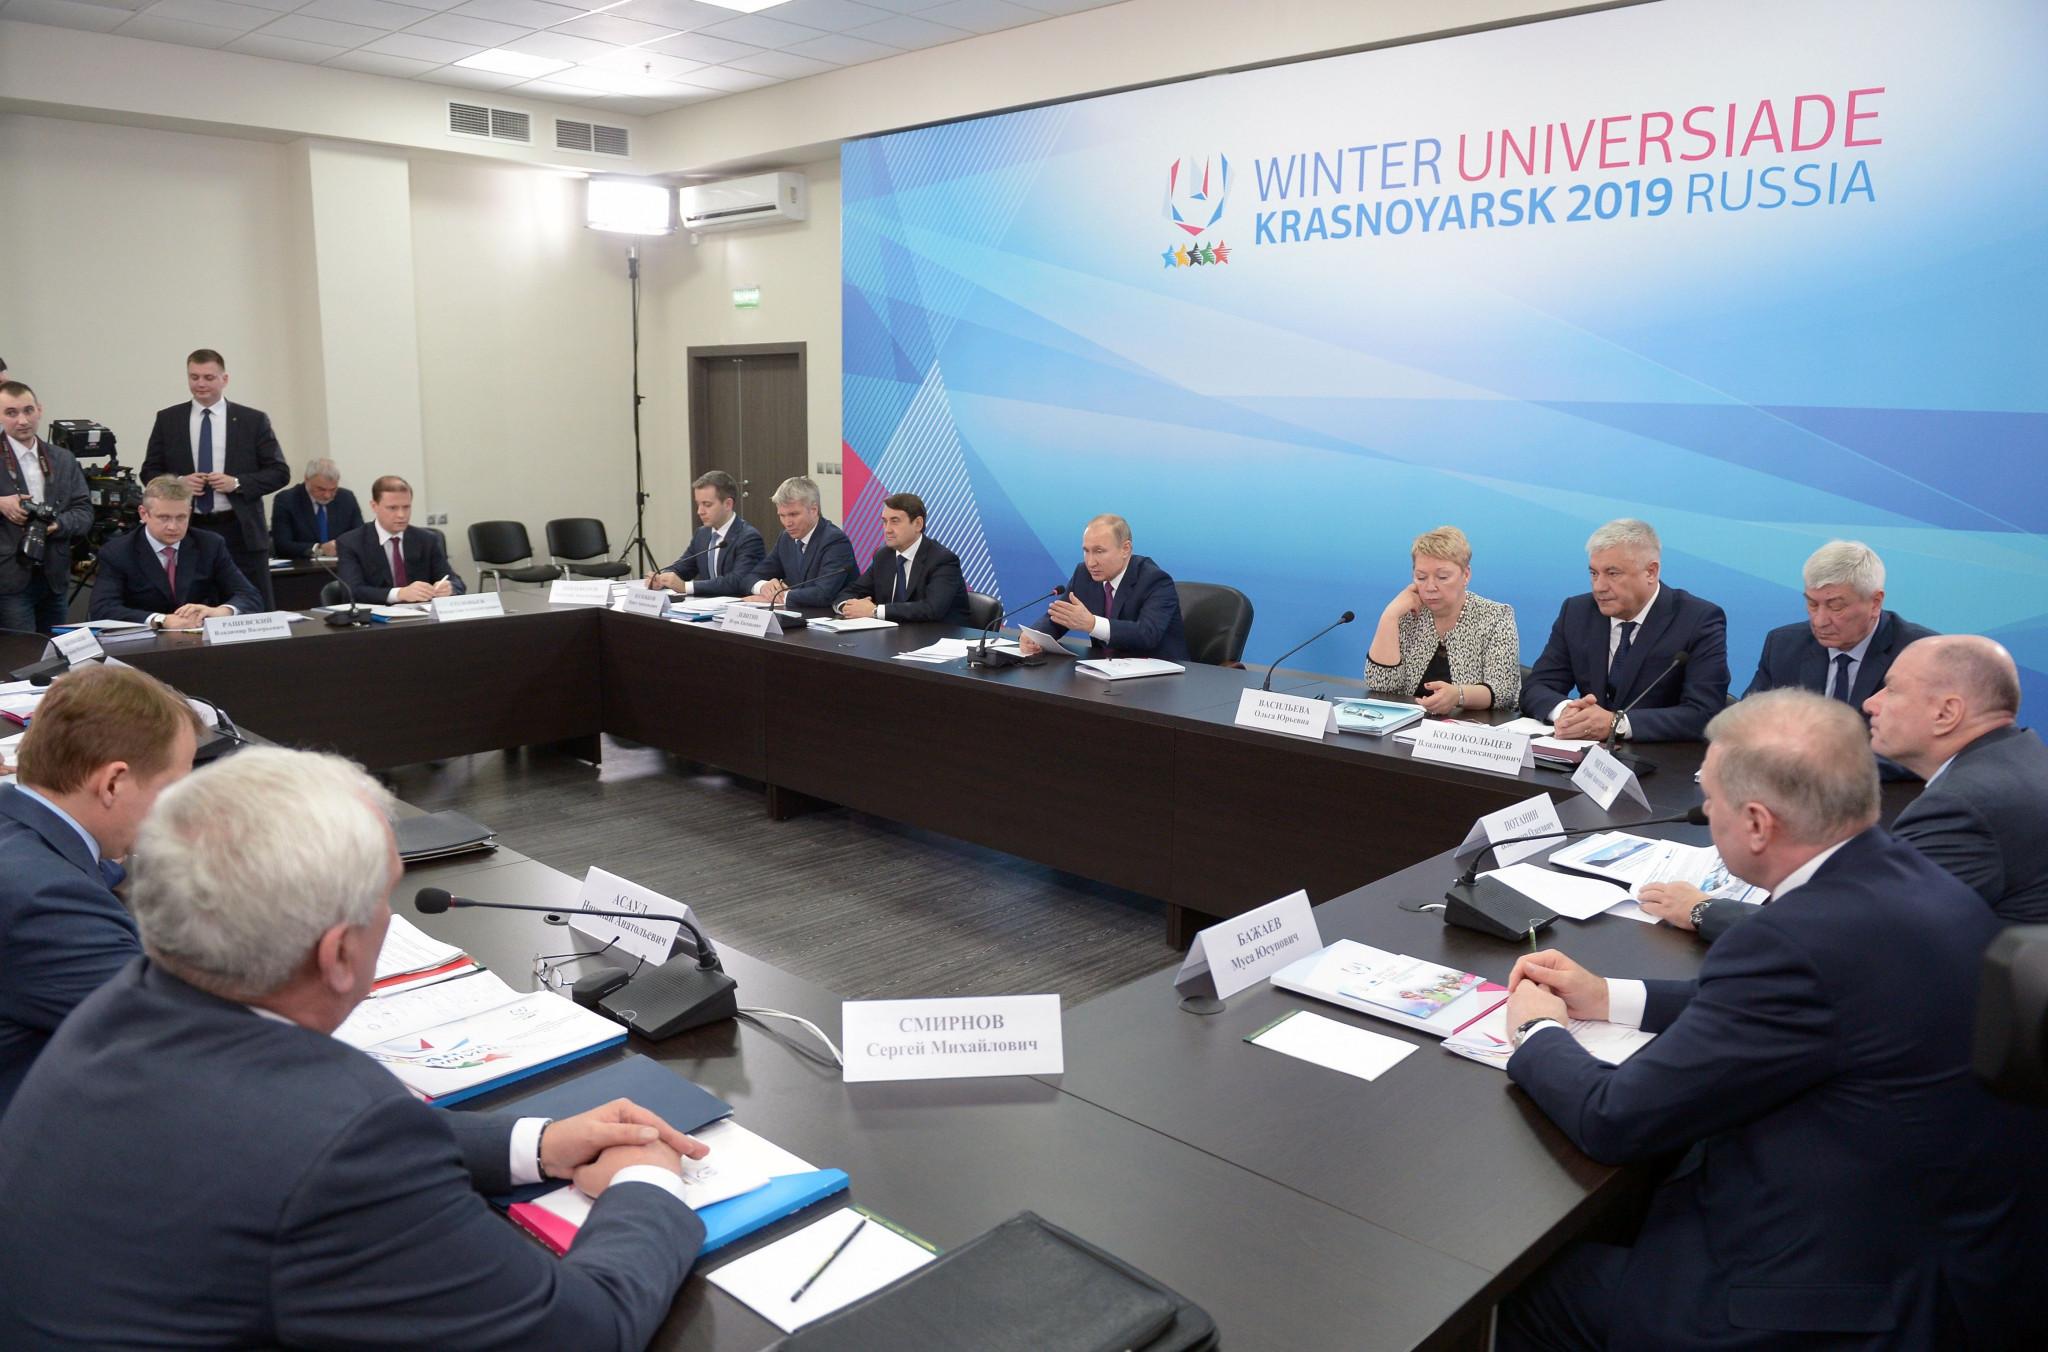 Russian President Vladimir Putin has been overseeing preparations for the Krasnoyarsk 2019 Winter Universiade ©Getty Images